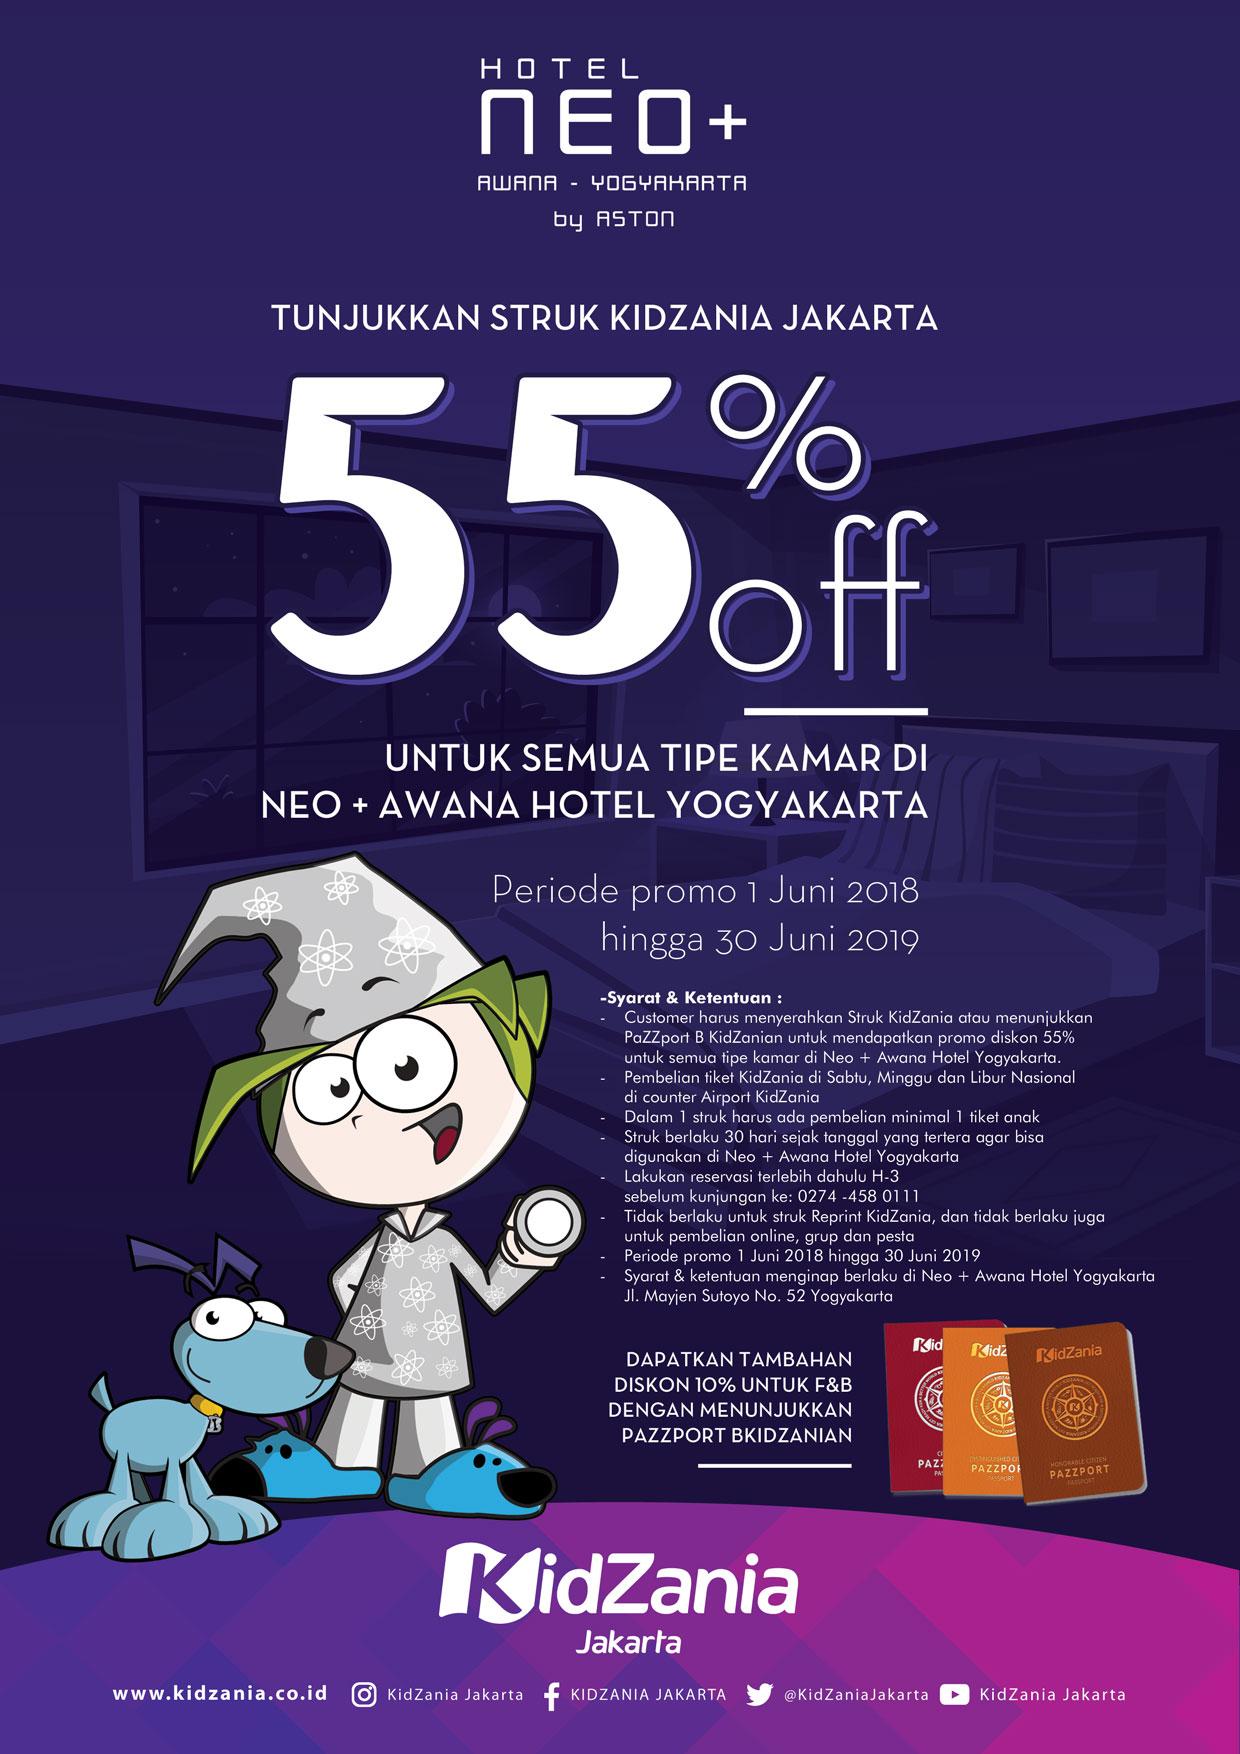 Promo Hotel Neo Awana Tiket Kidzania 3037